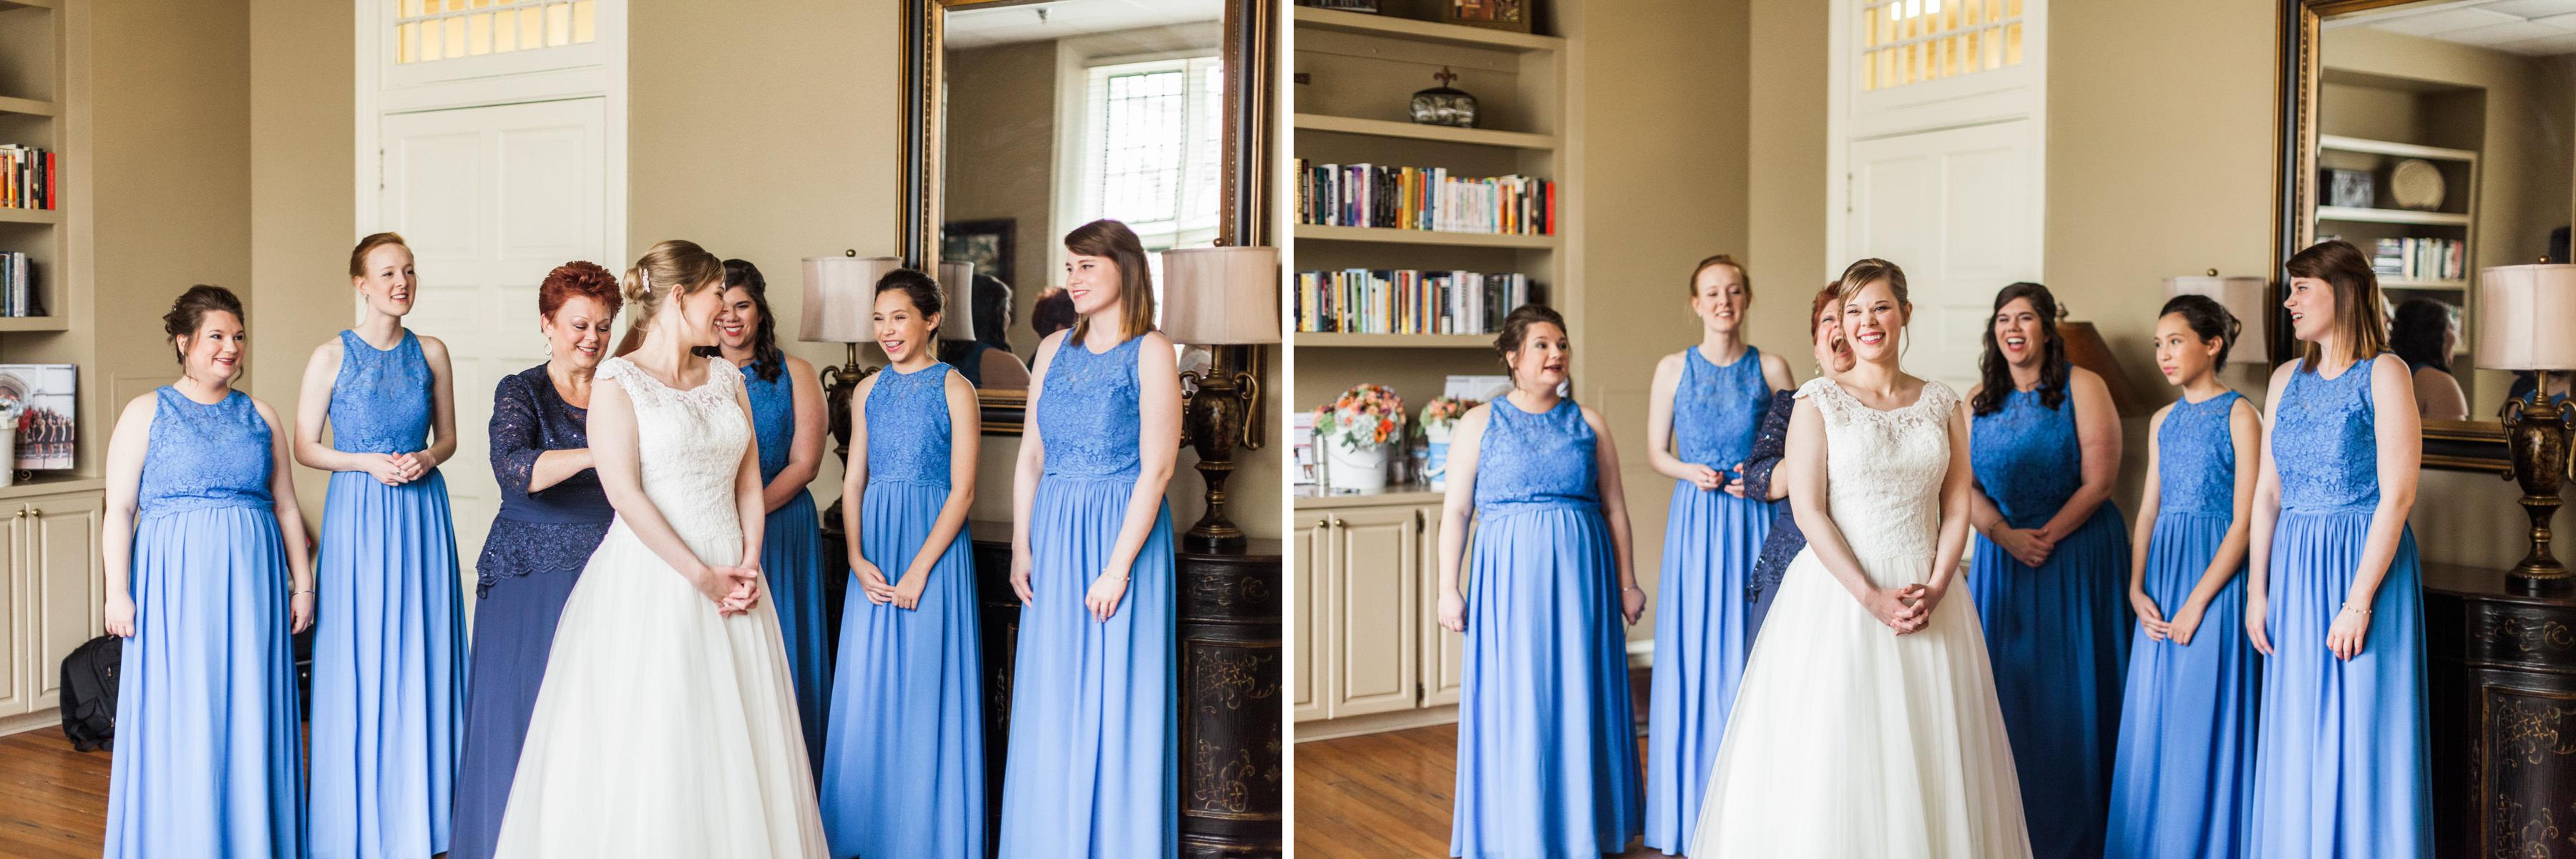 MAULDIN_WEDDING_MONTGOMERY_ALABAMA_WEDDING_PHOTOGRAPHY_18